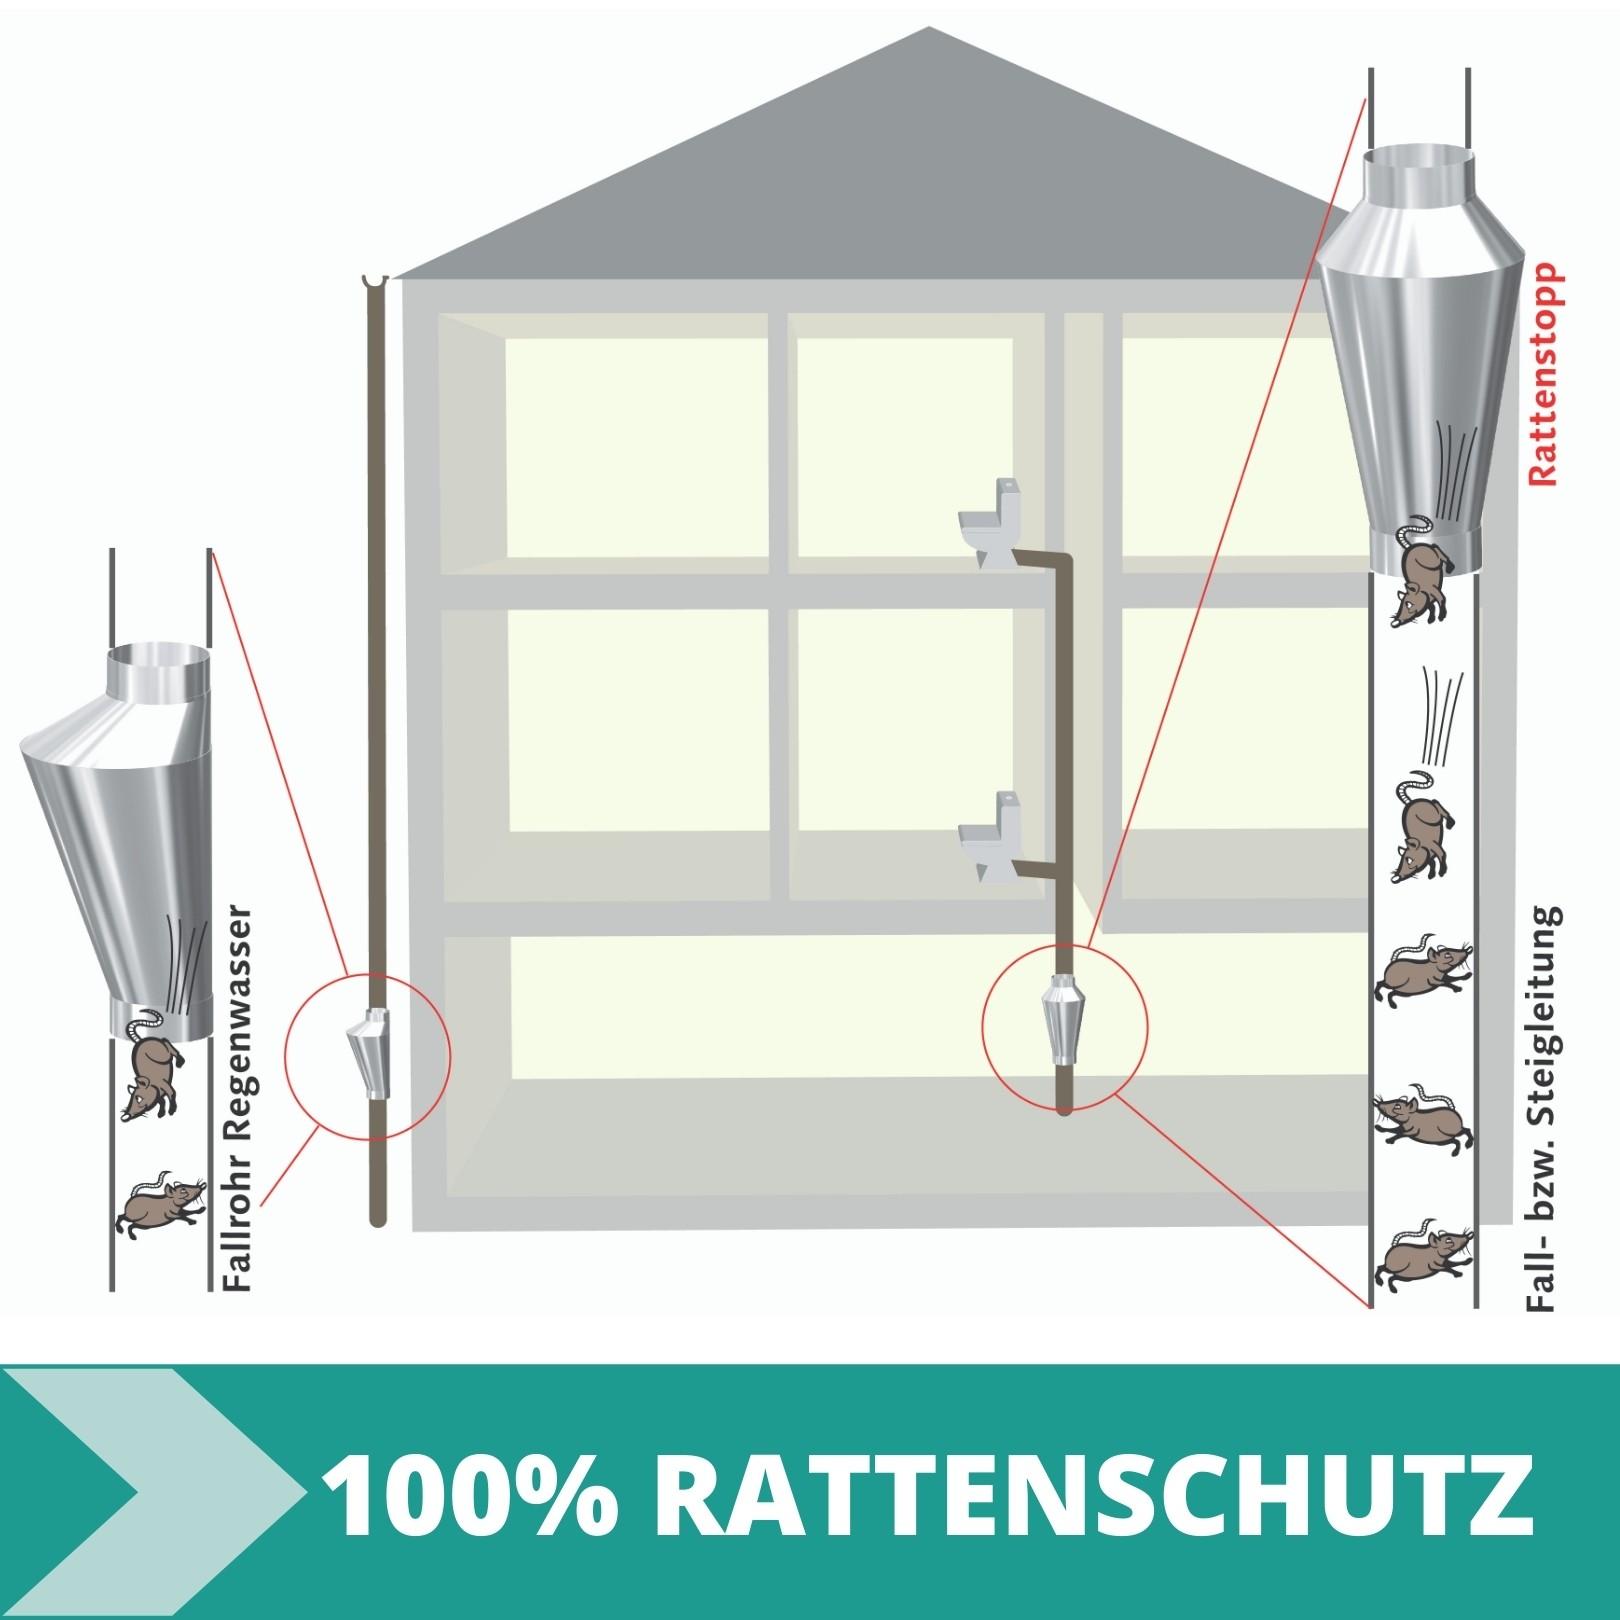 Rattenstopp/Rattenfalle Funktionsprinzip